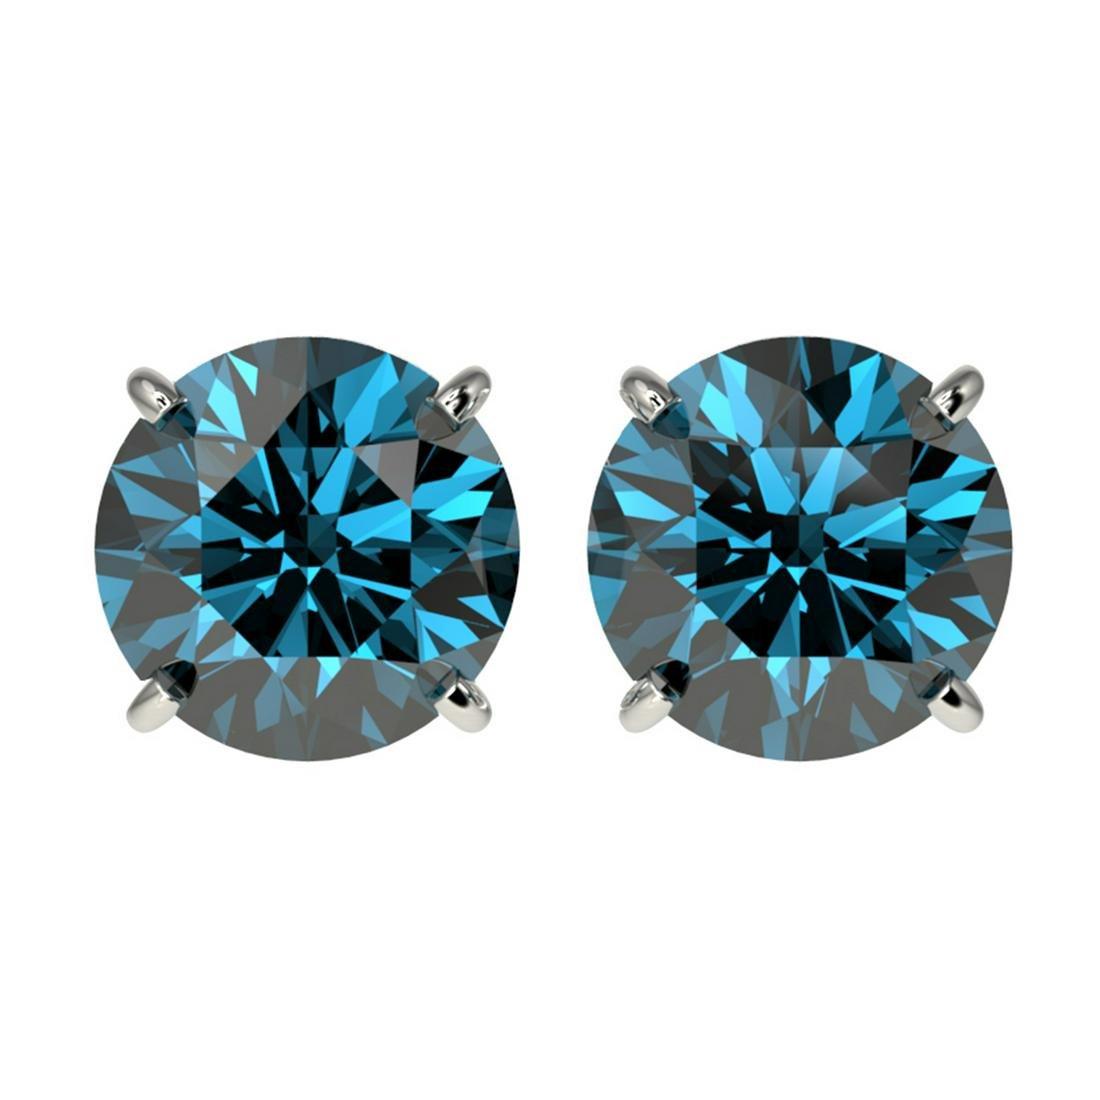 2.56 ctw Intense Blue Diamond Stud Earrings 10K White